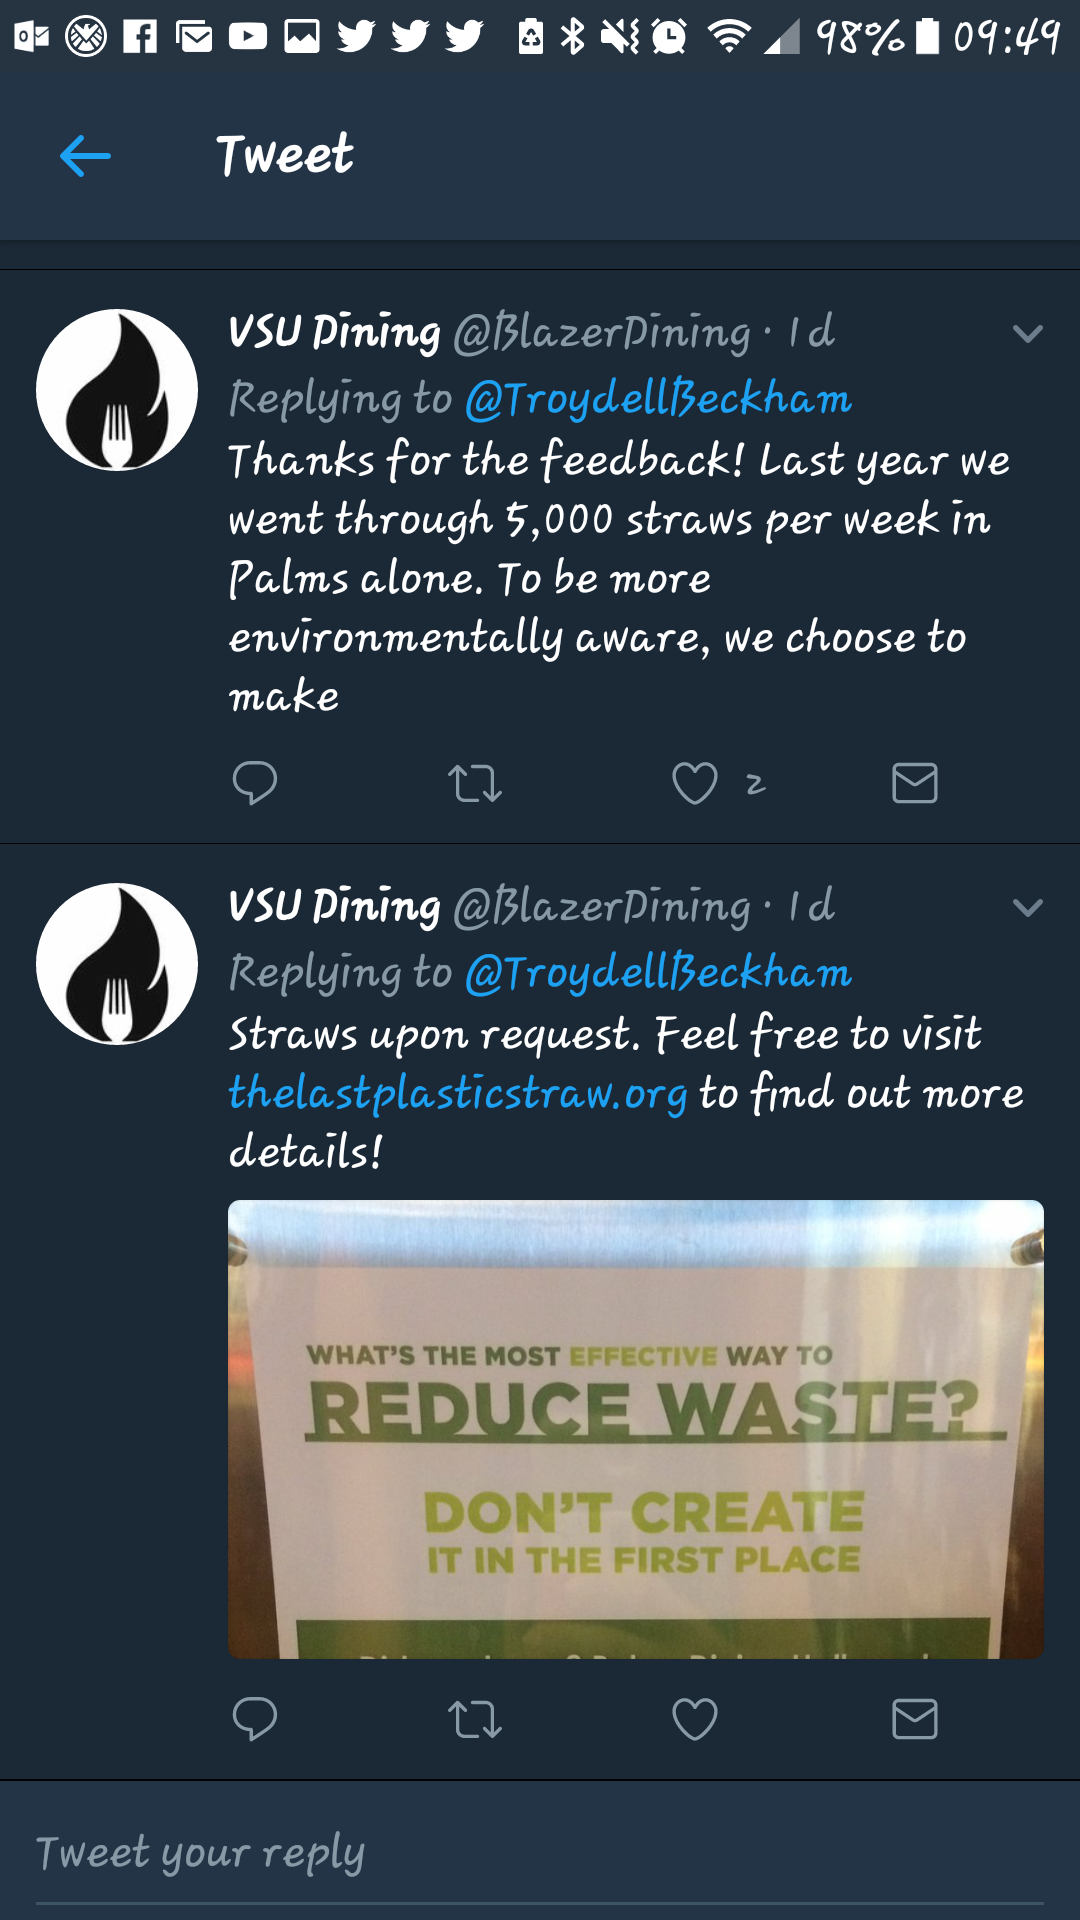 @BlazerDining's response